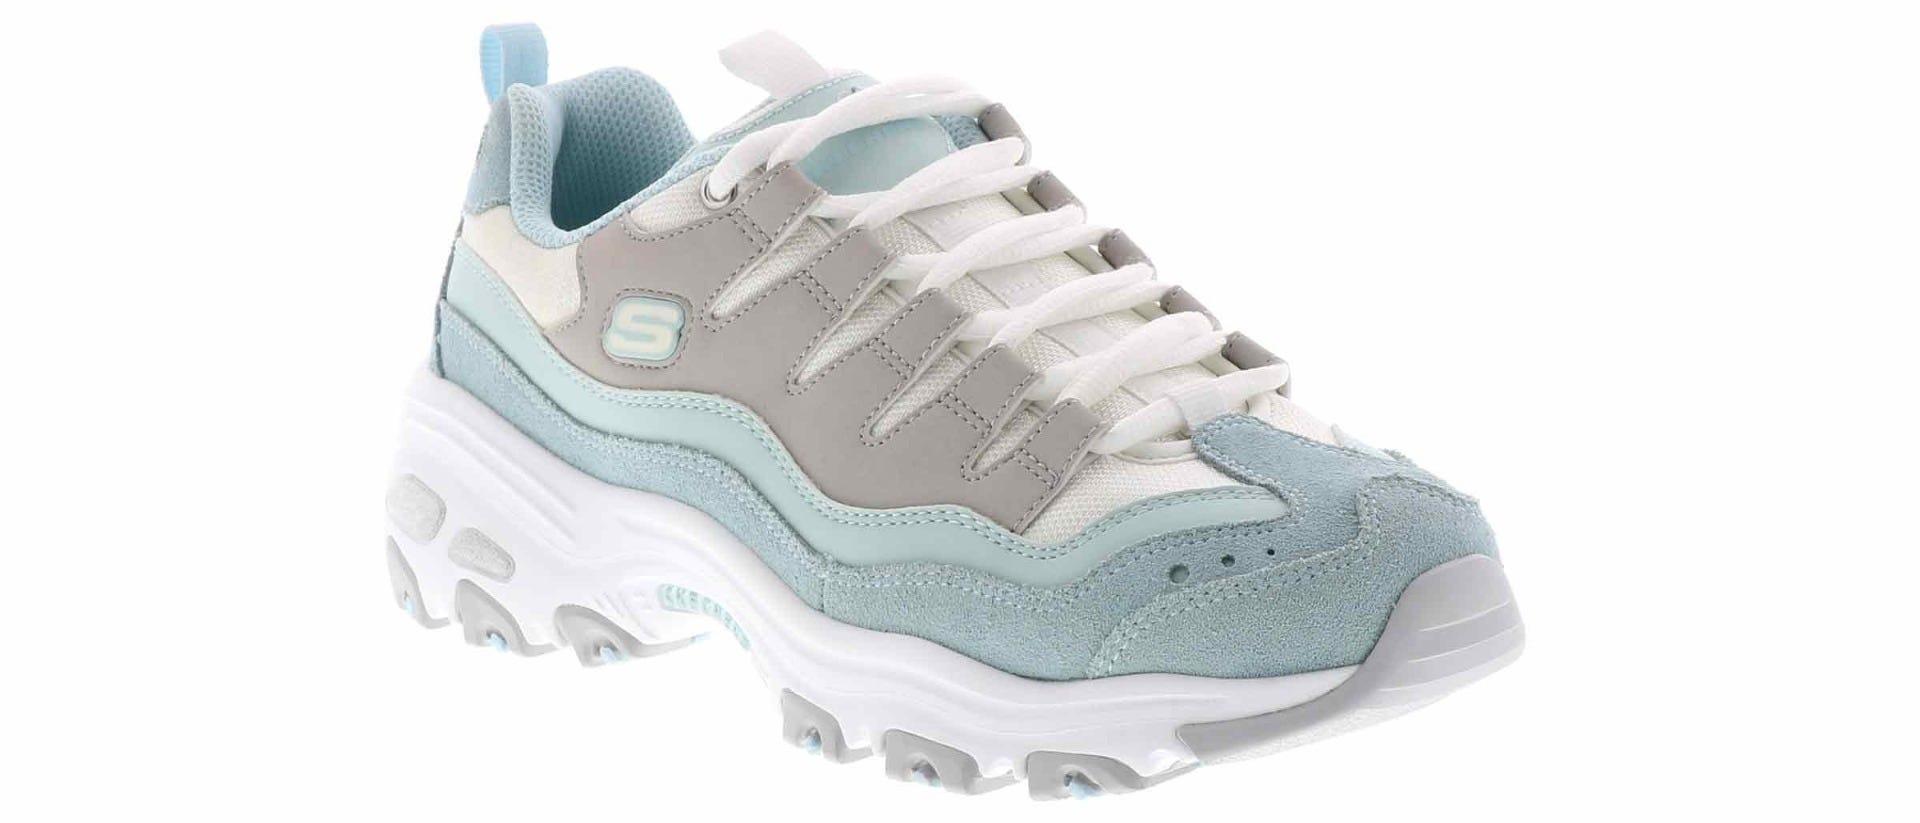 Skechers Dlites Sure Thing Womens Light bluee Grey Fashion